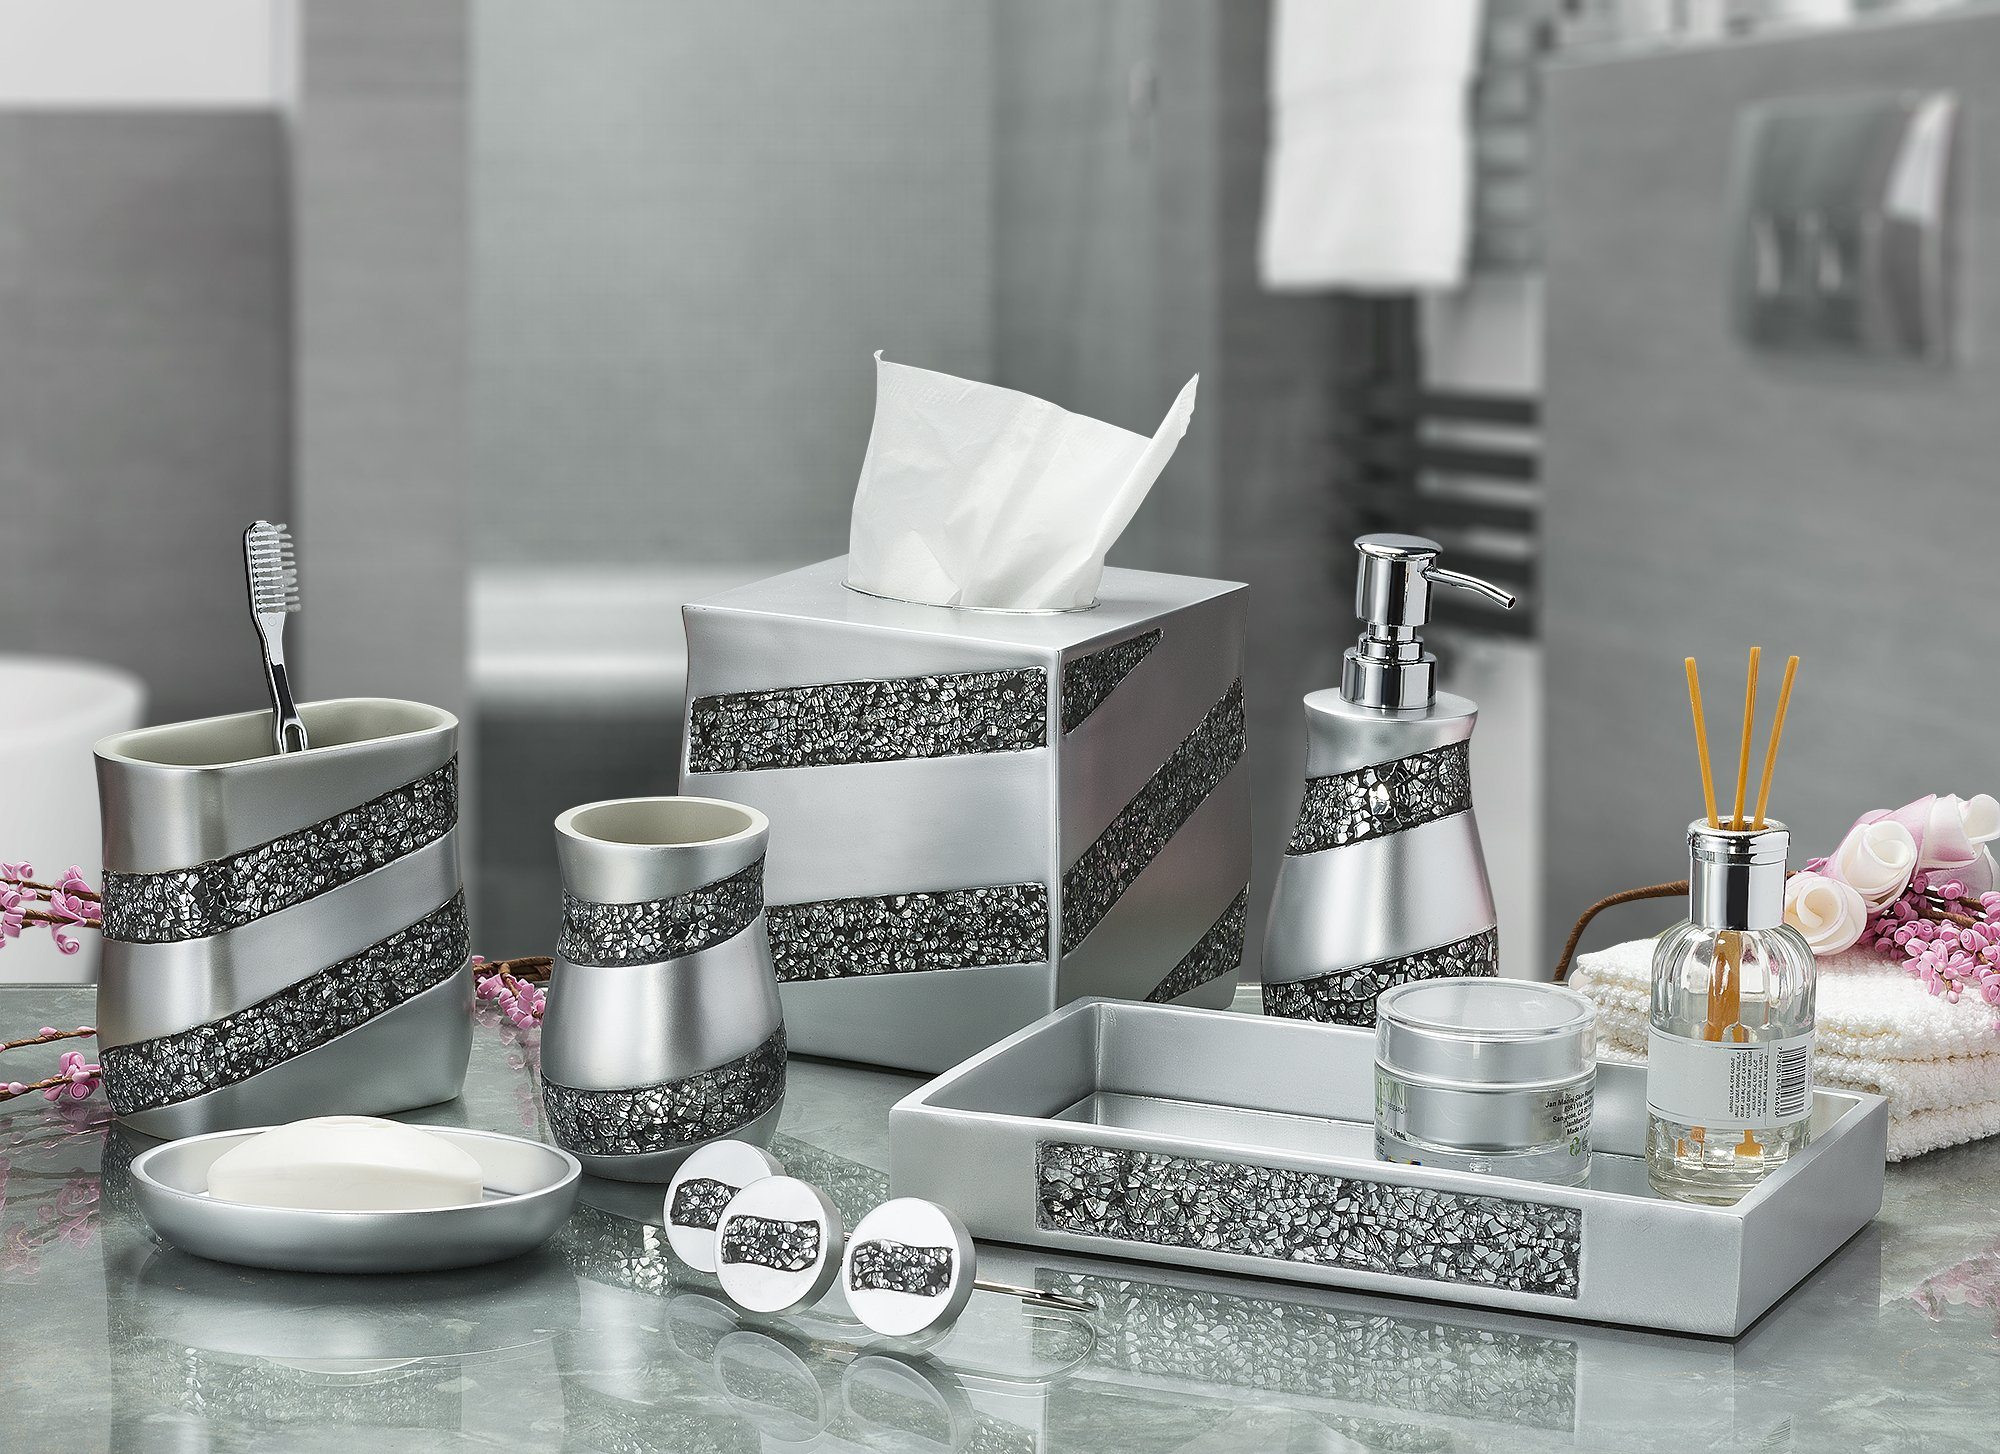 Dwellza Silver Mosaic Vanity Mirror Tray for Dresser 111 x 62 x